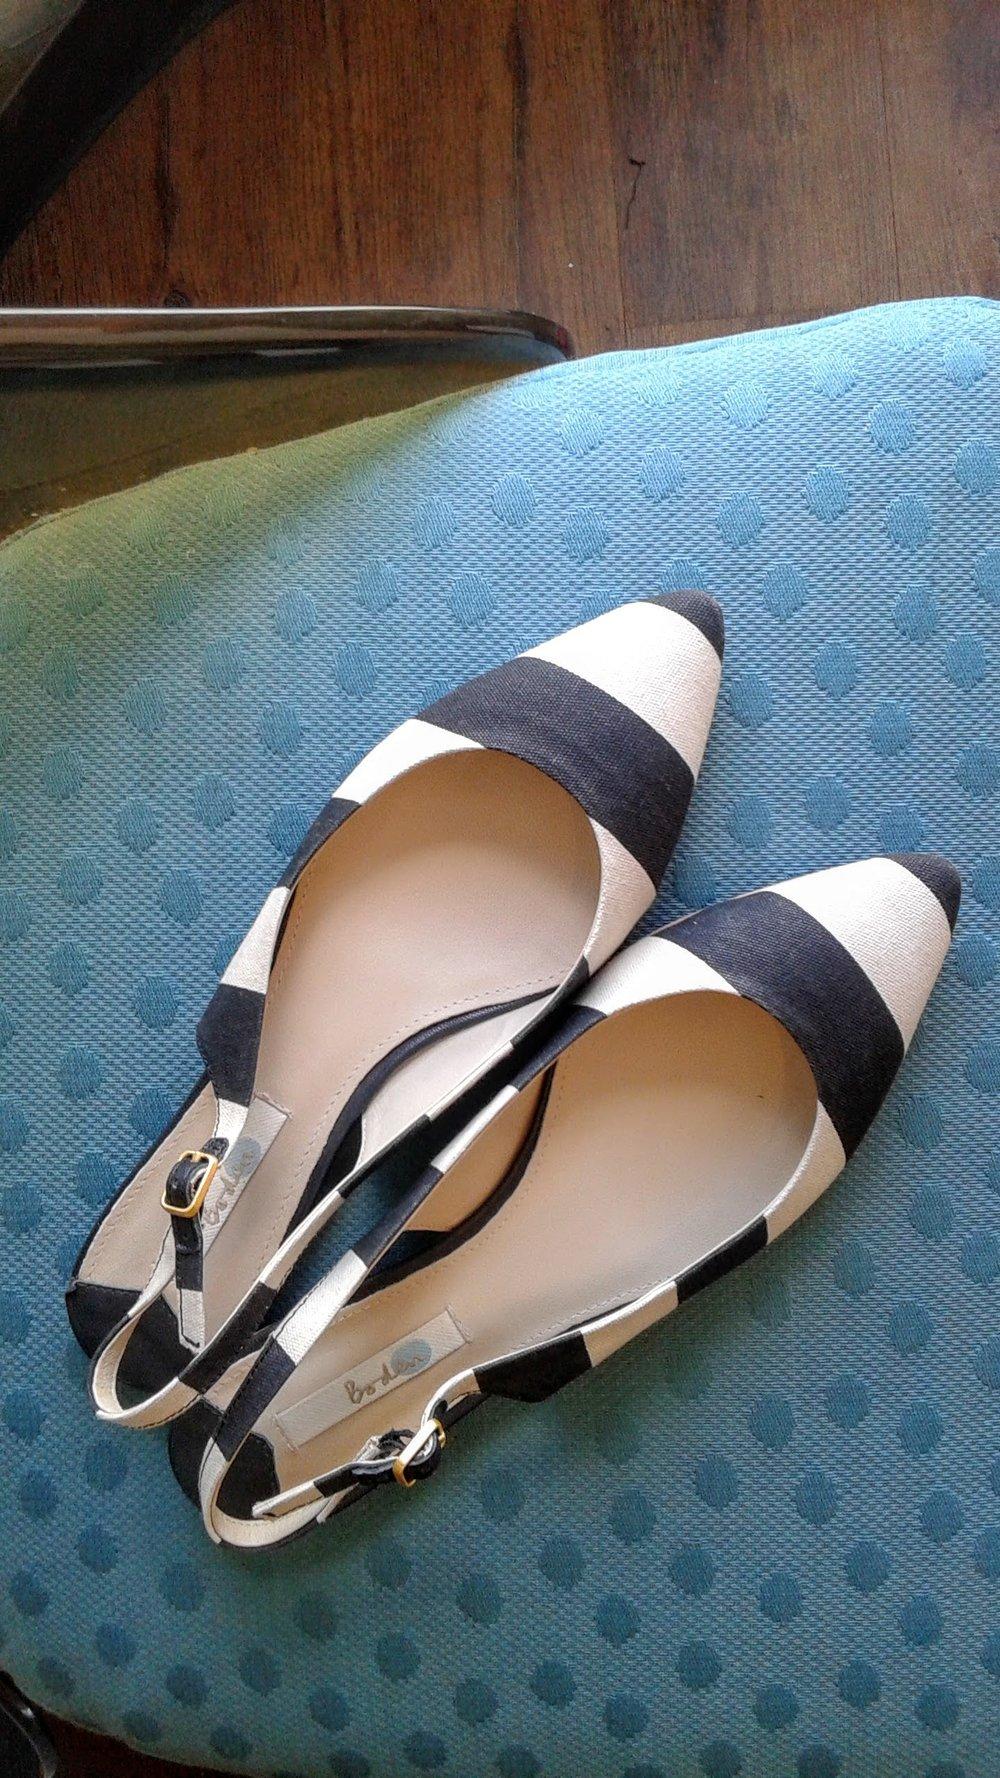 Boden shoes; S9.5, $26